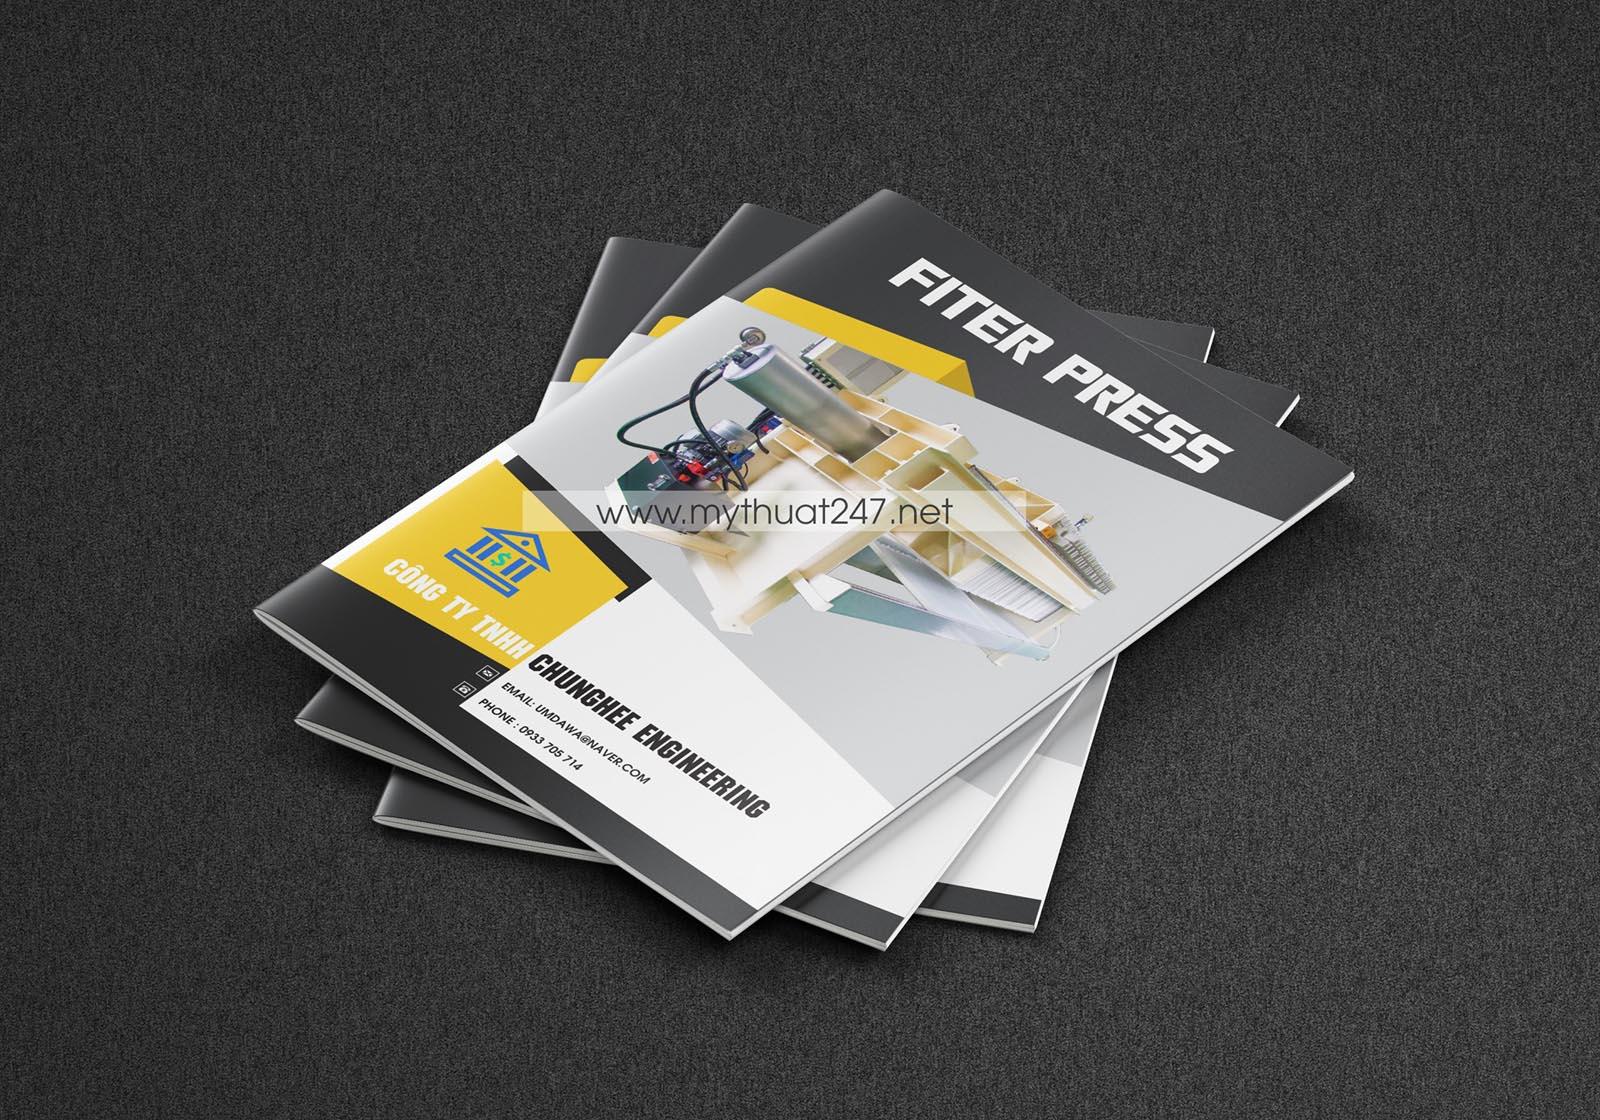 Thiết kế catalogue công ty Chunghee engineering